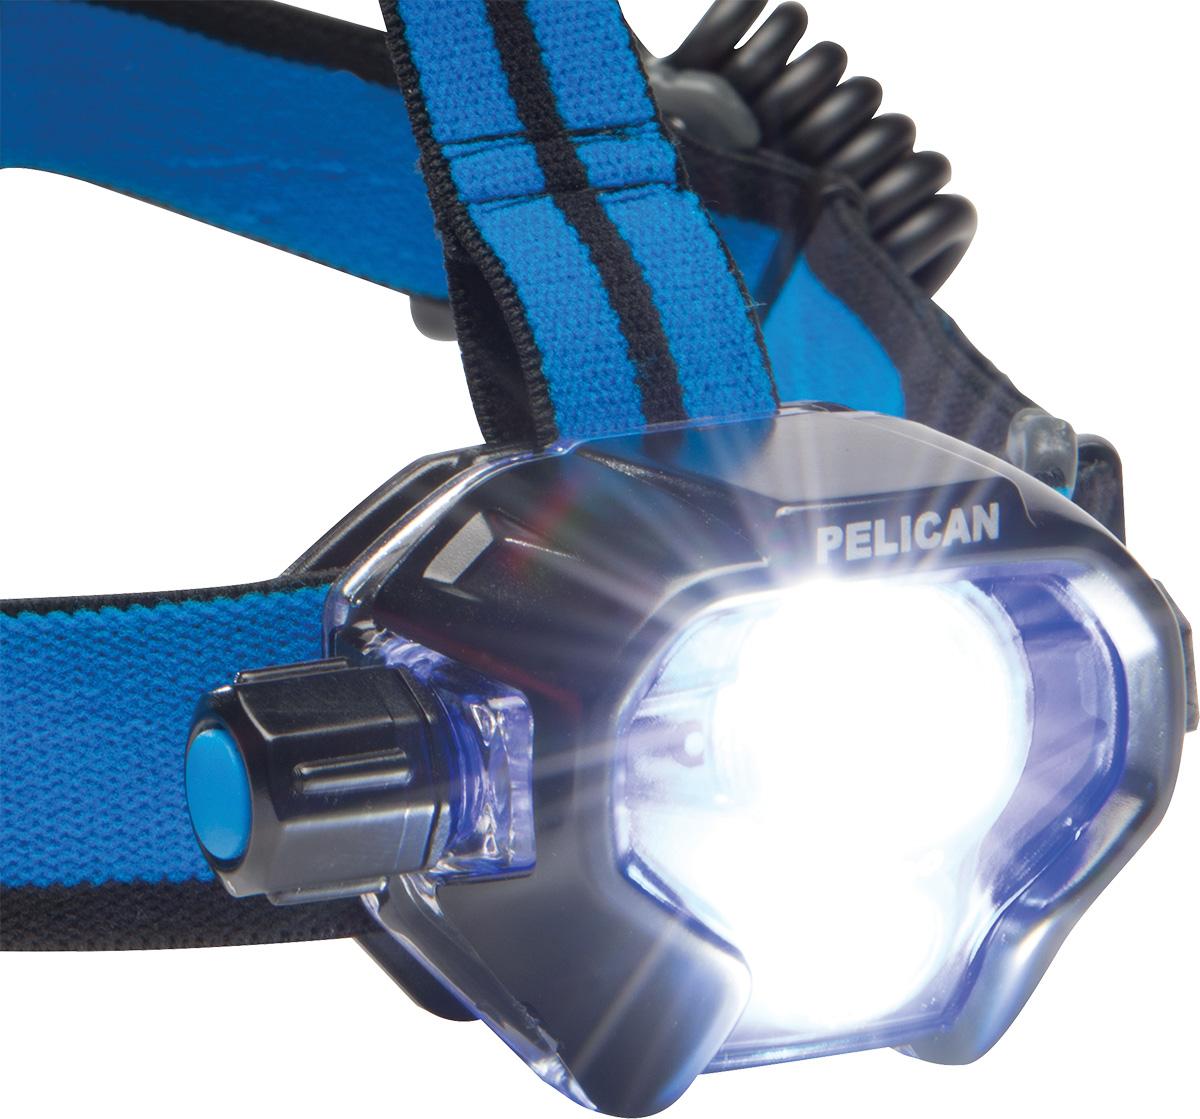 pelican super bright high lumens headlamp